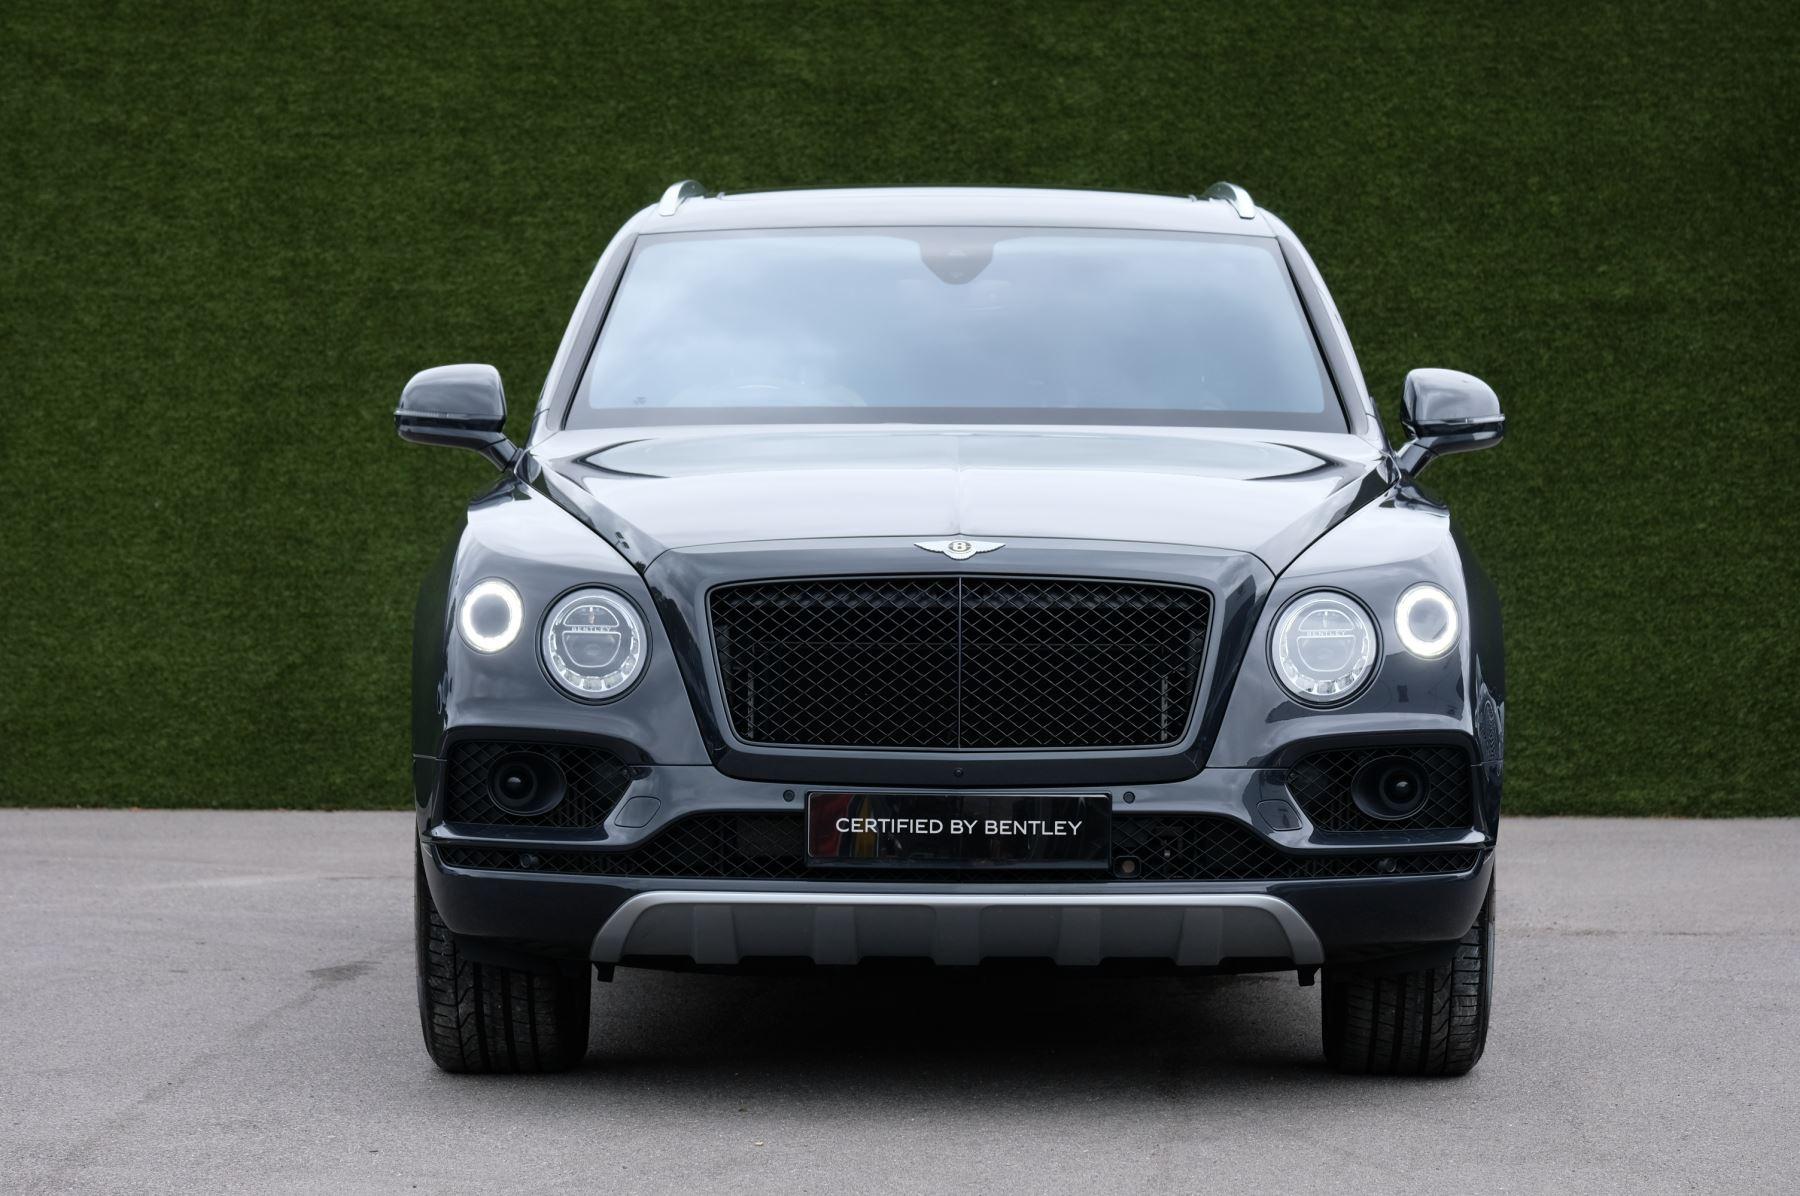 Bentley Bentayga Hybrid 3.0 V6 5dr image 2